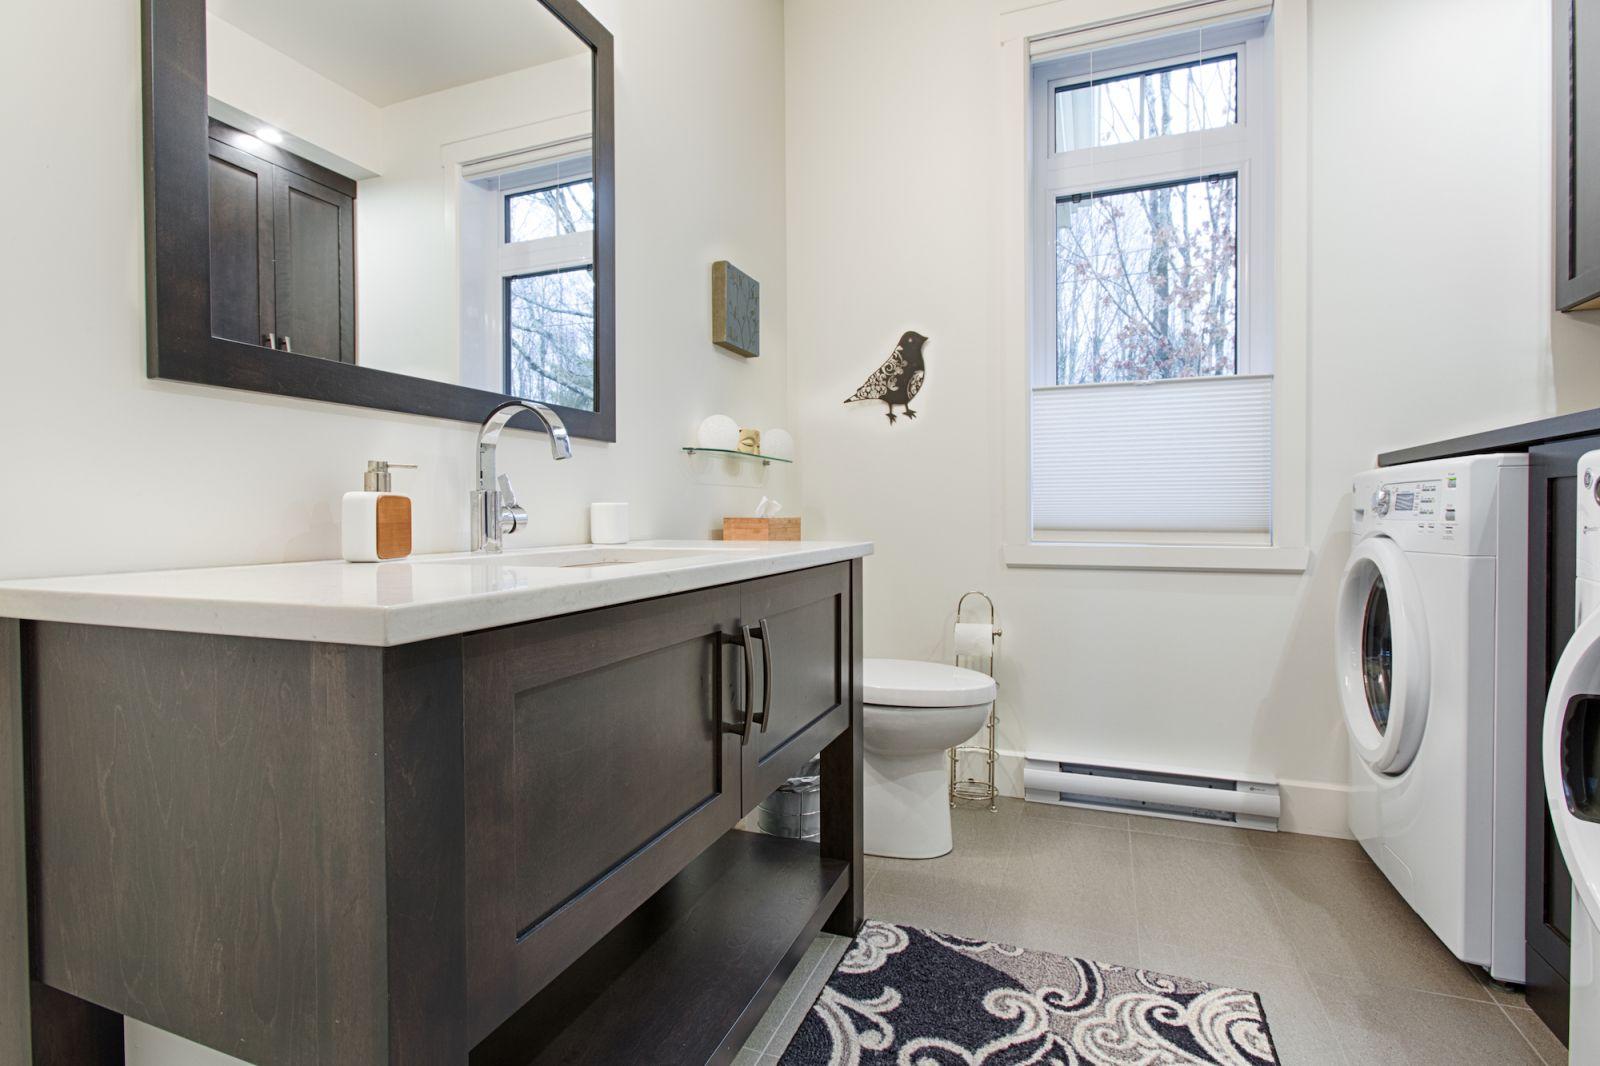 Accessoire Salle De Bain Sherbrooke ~ meubles de salle de bain cookshire pr s de sherbrooke en estrie